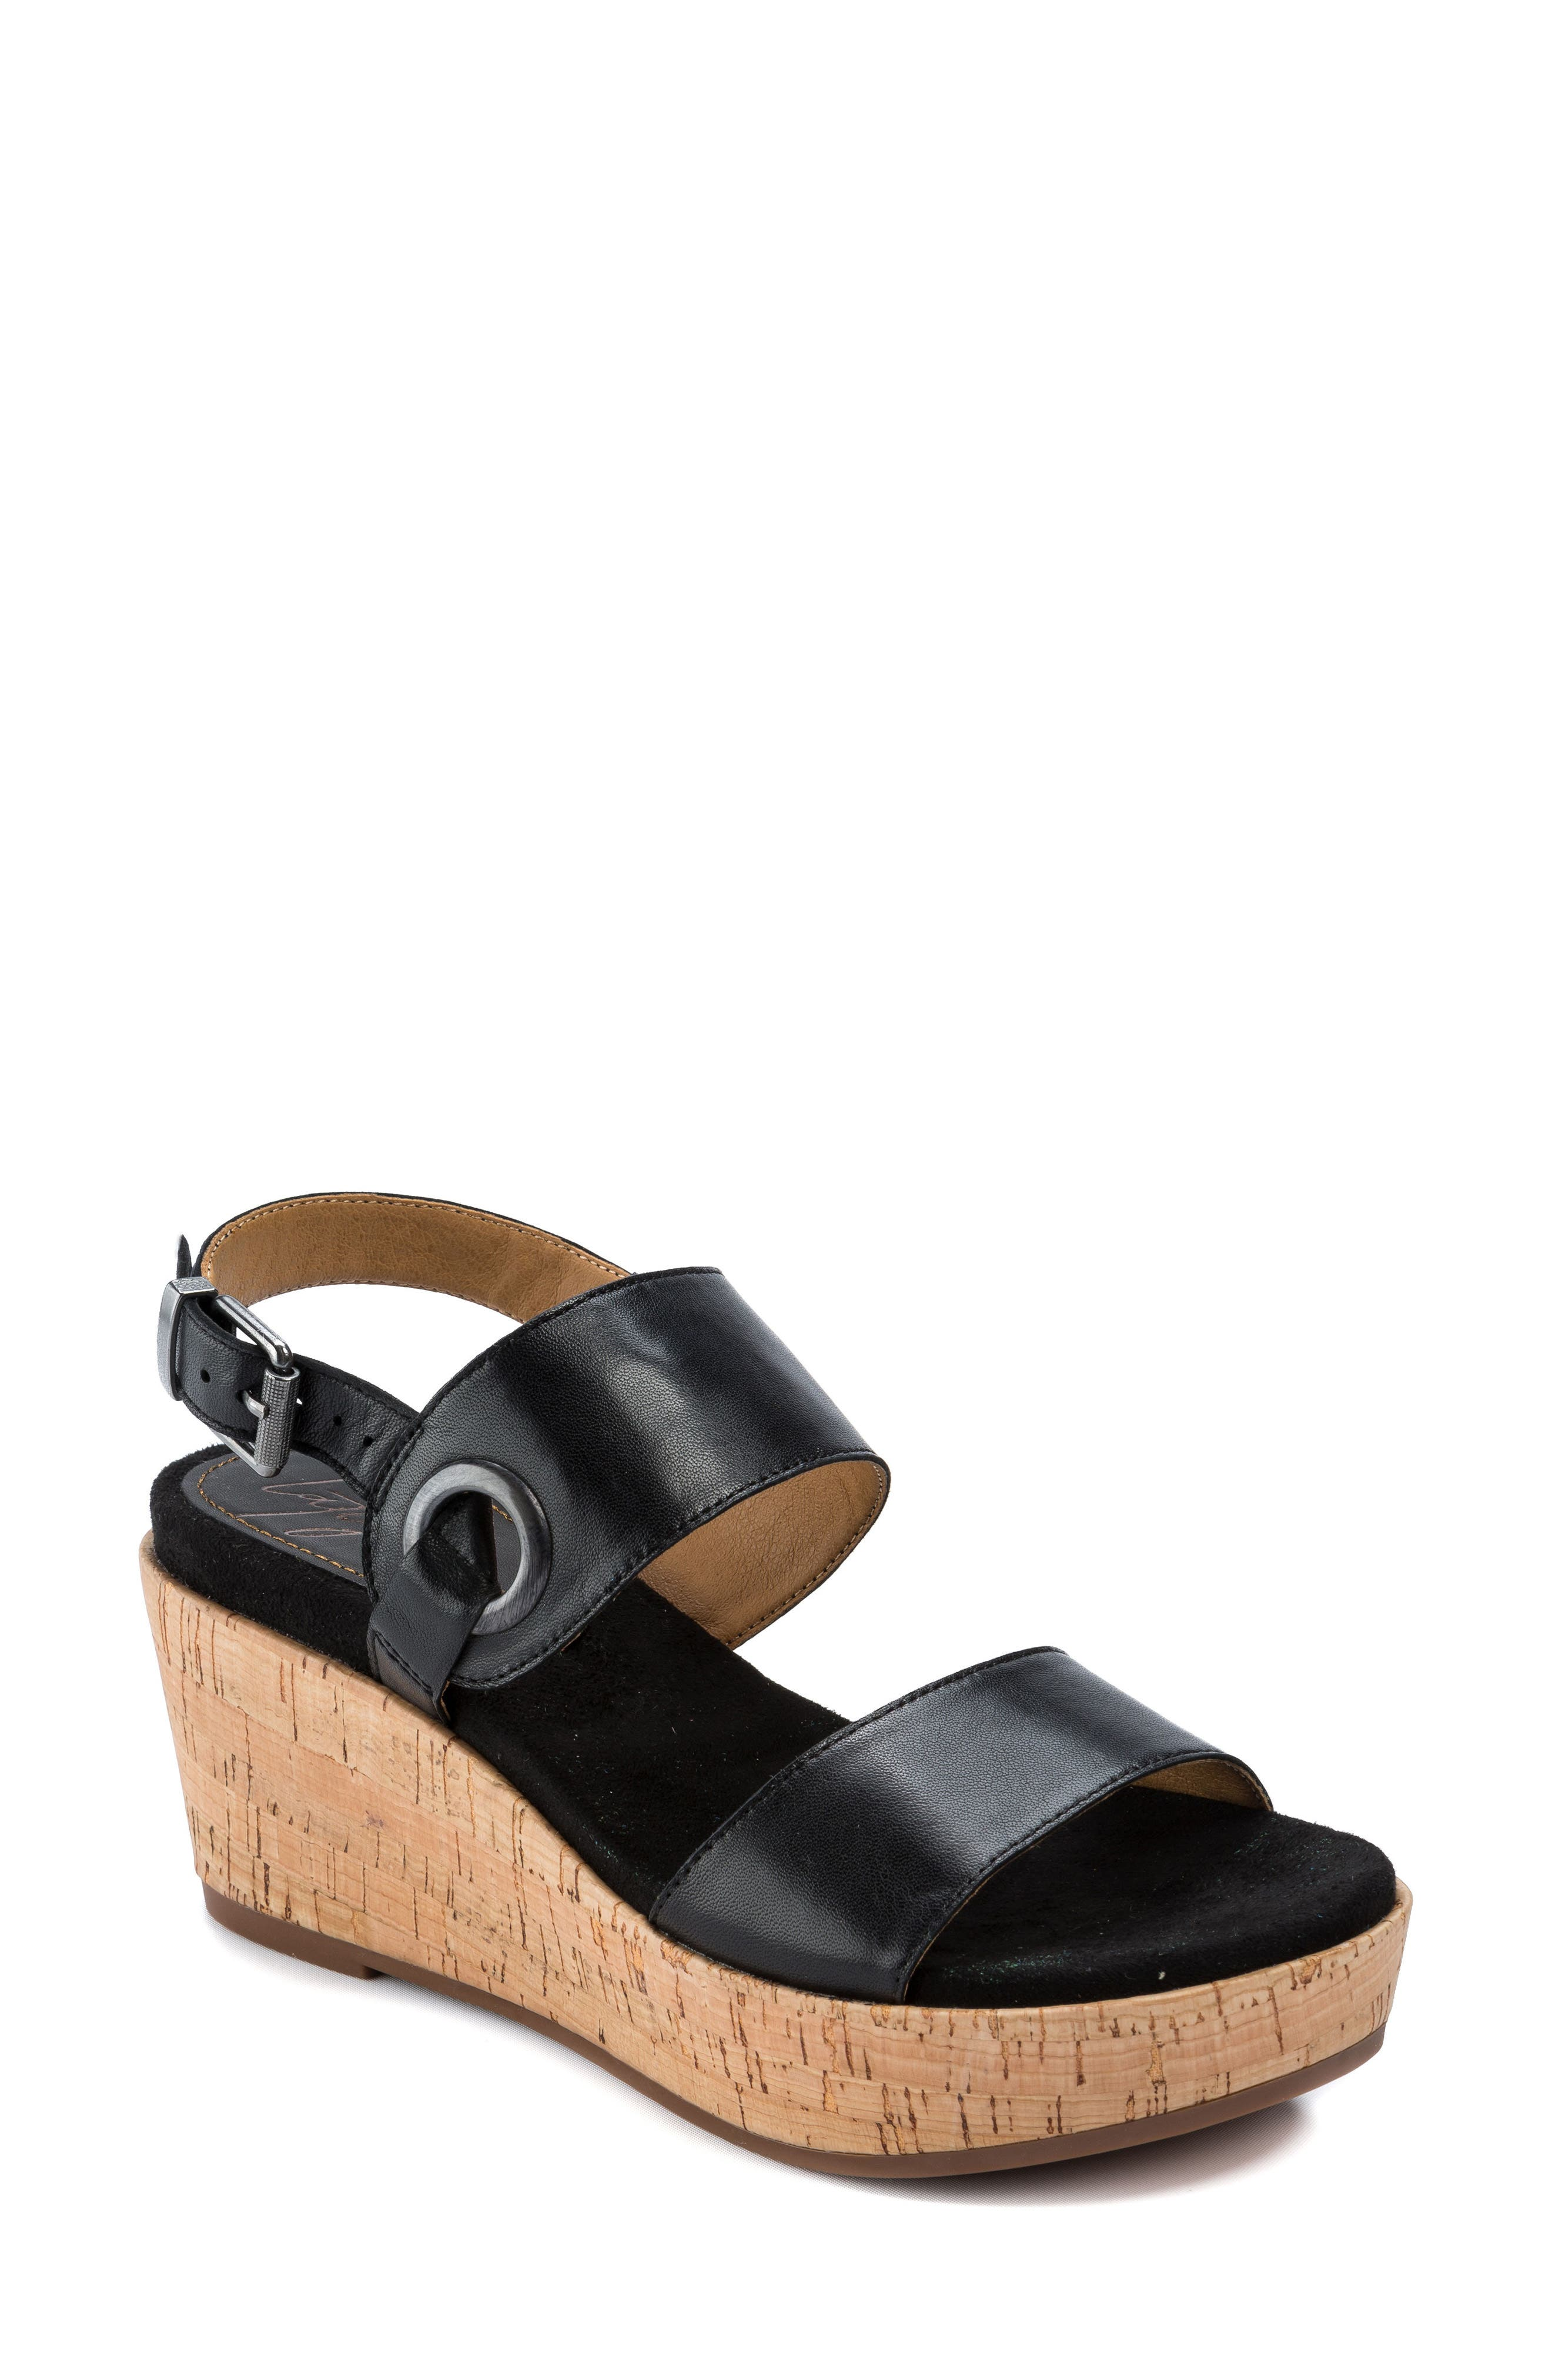 Lauren Platform Wedge Sandal,                             Main thumbnail 1, color,                             001